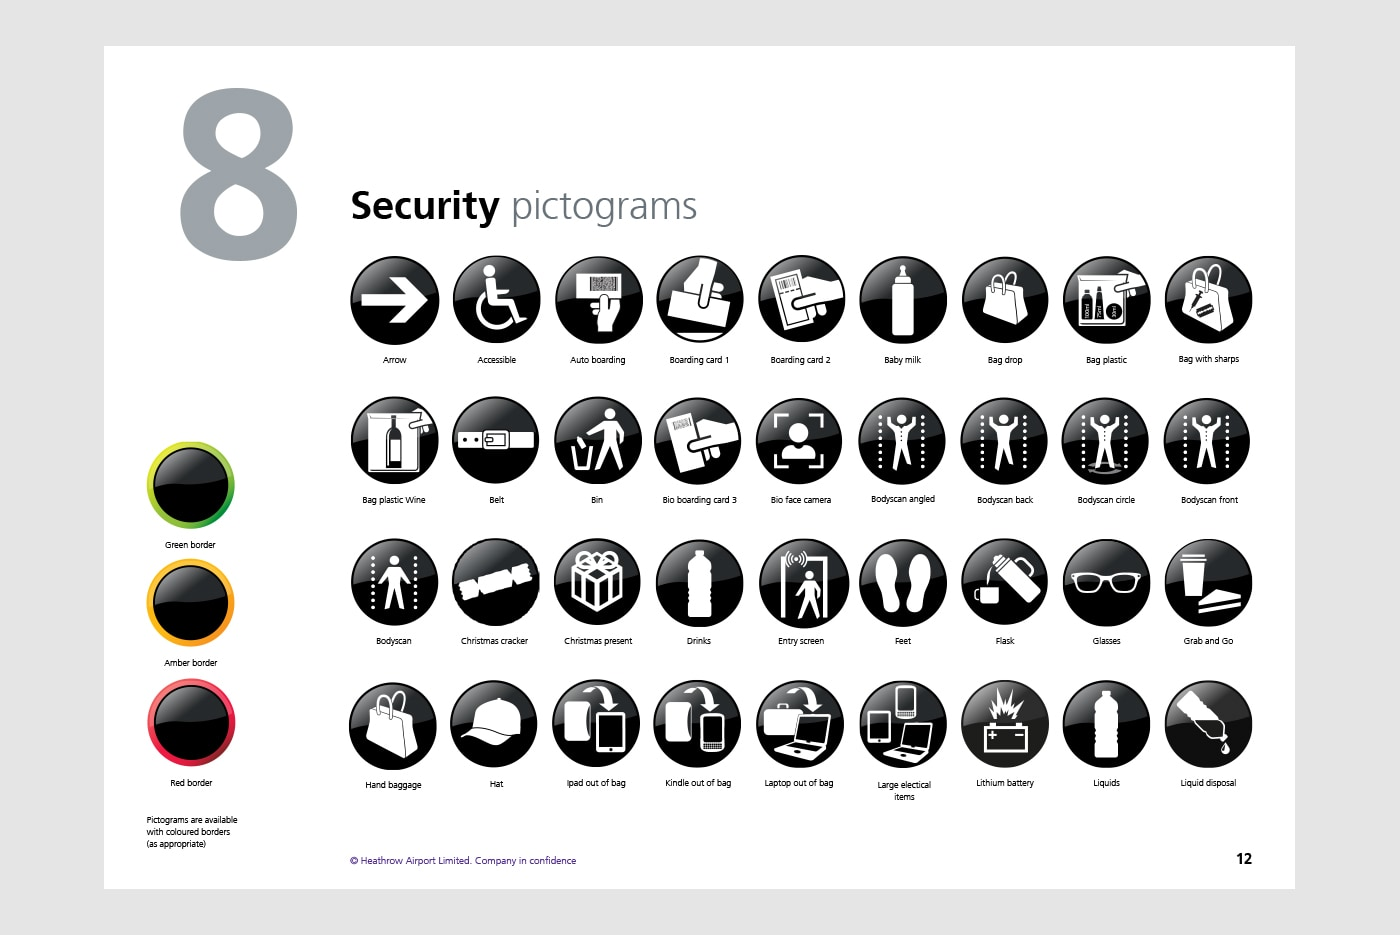 Heathrow Airport pictograms